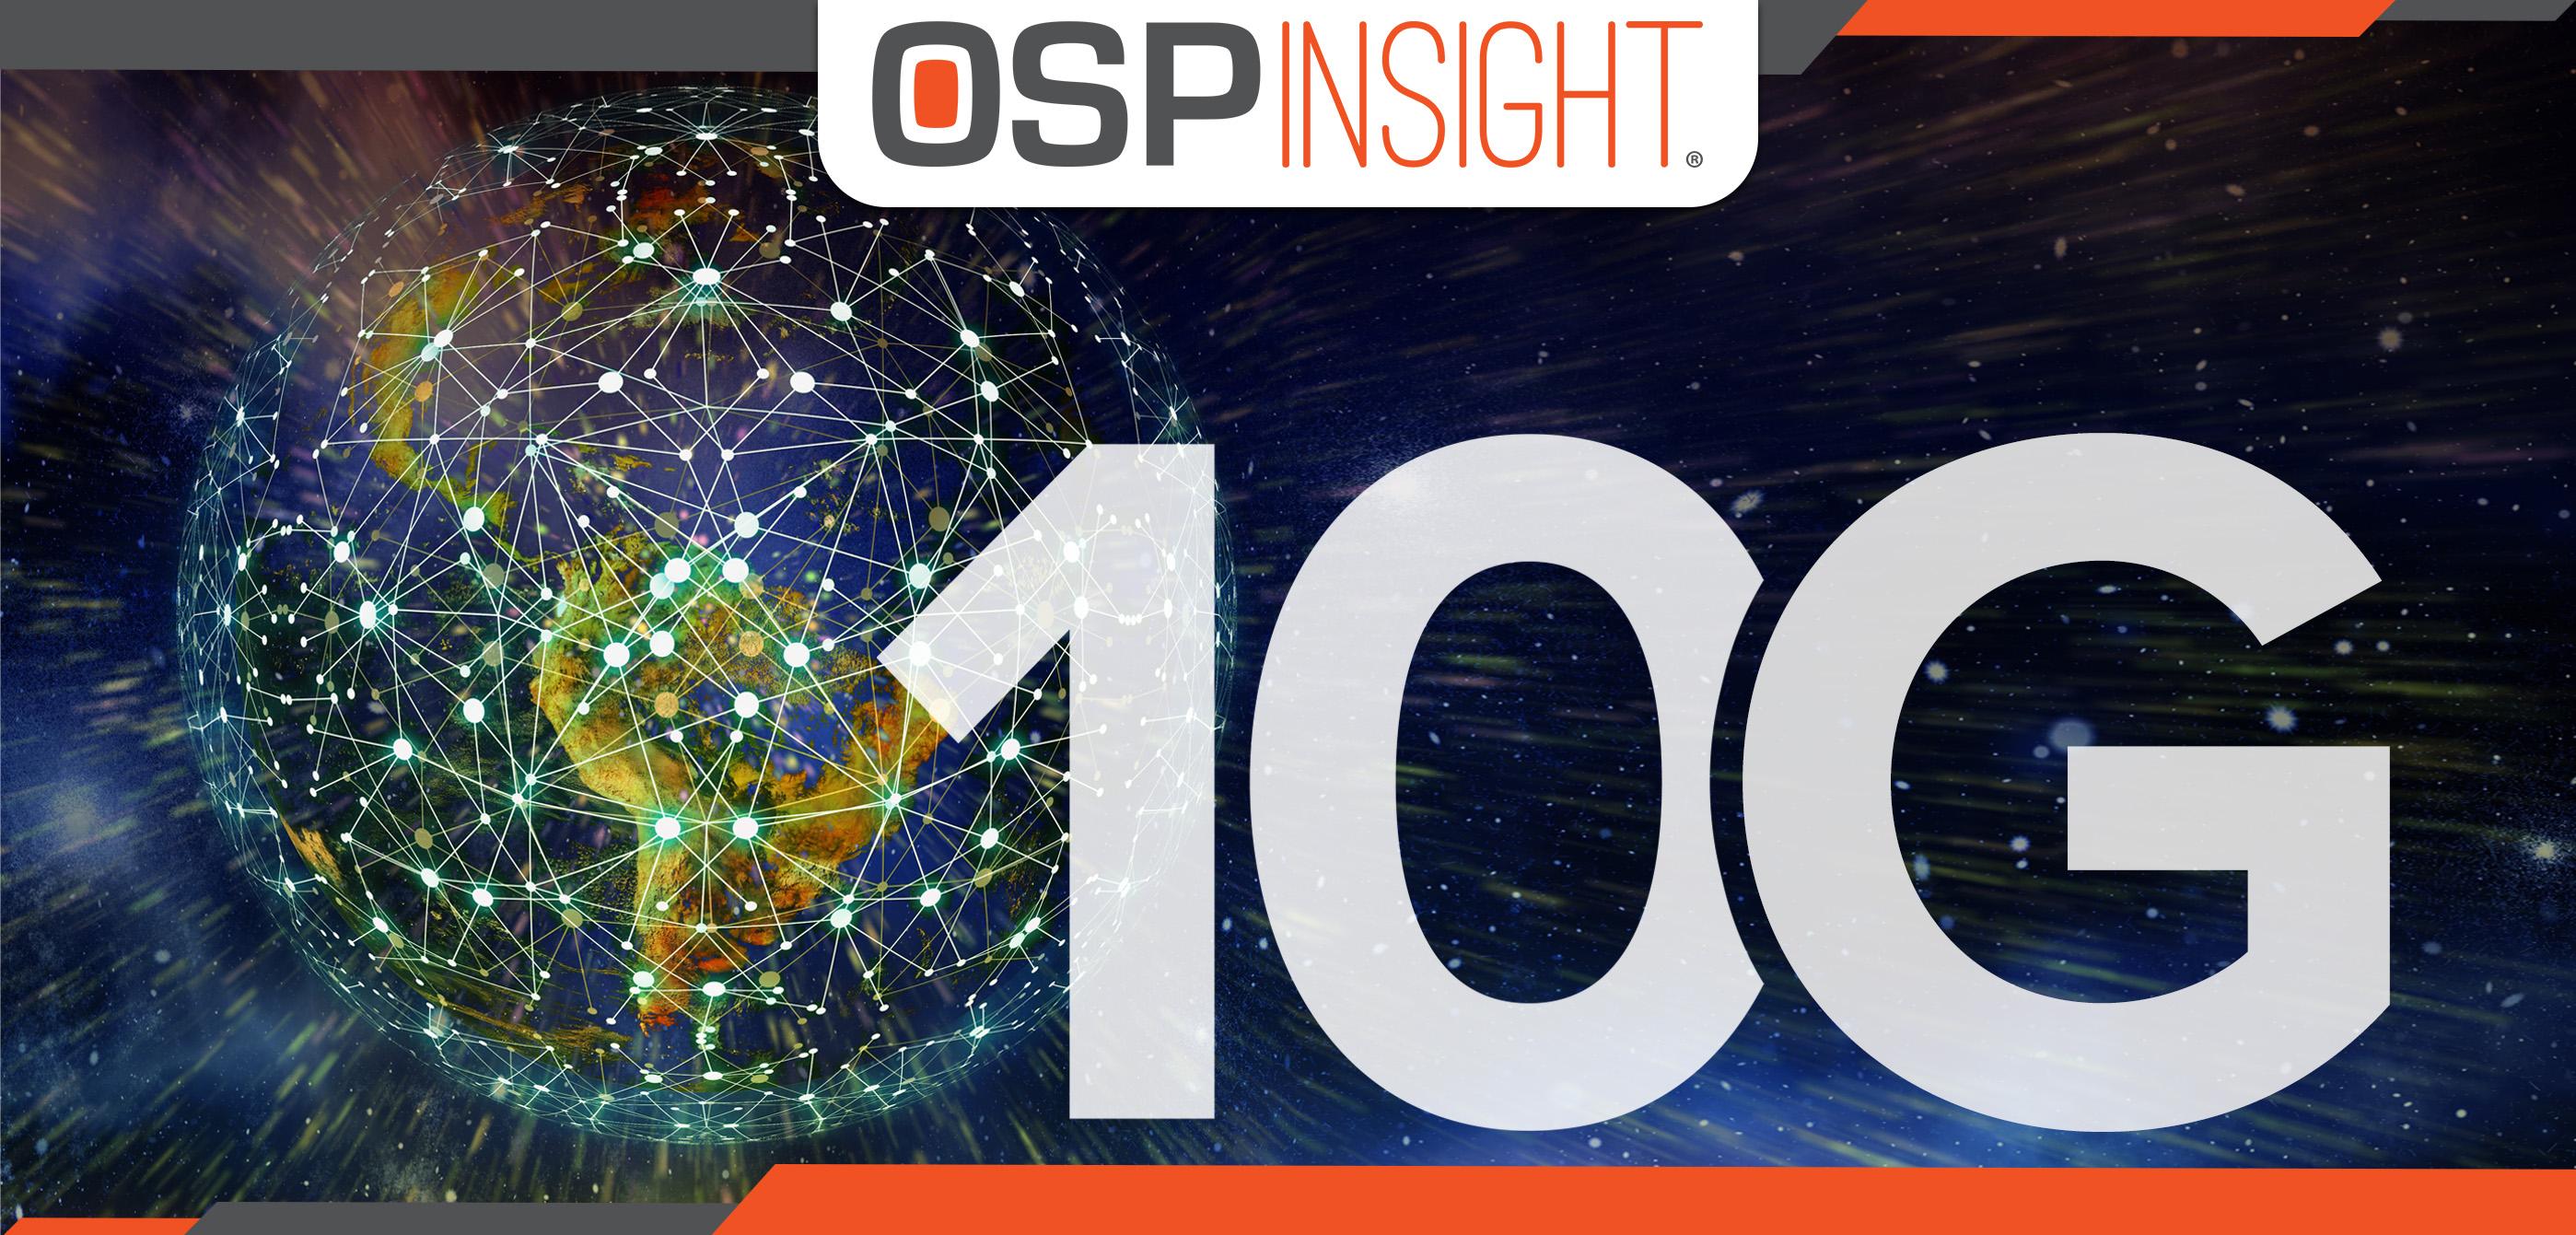 Next-Gen Broadband - 10G Networks (featured image) (02)